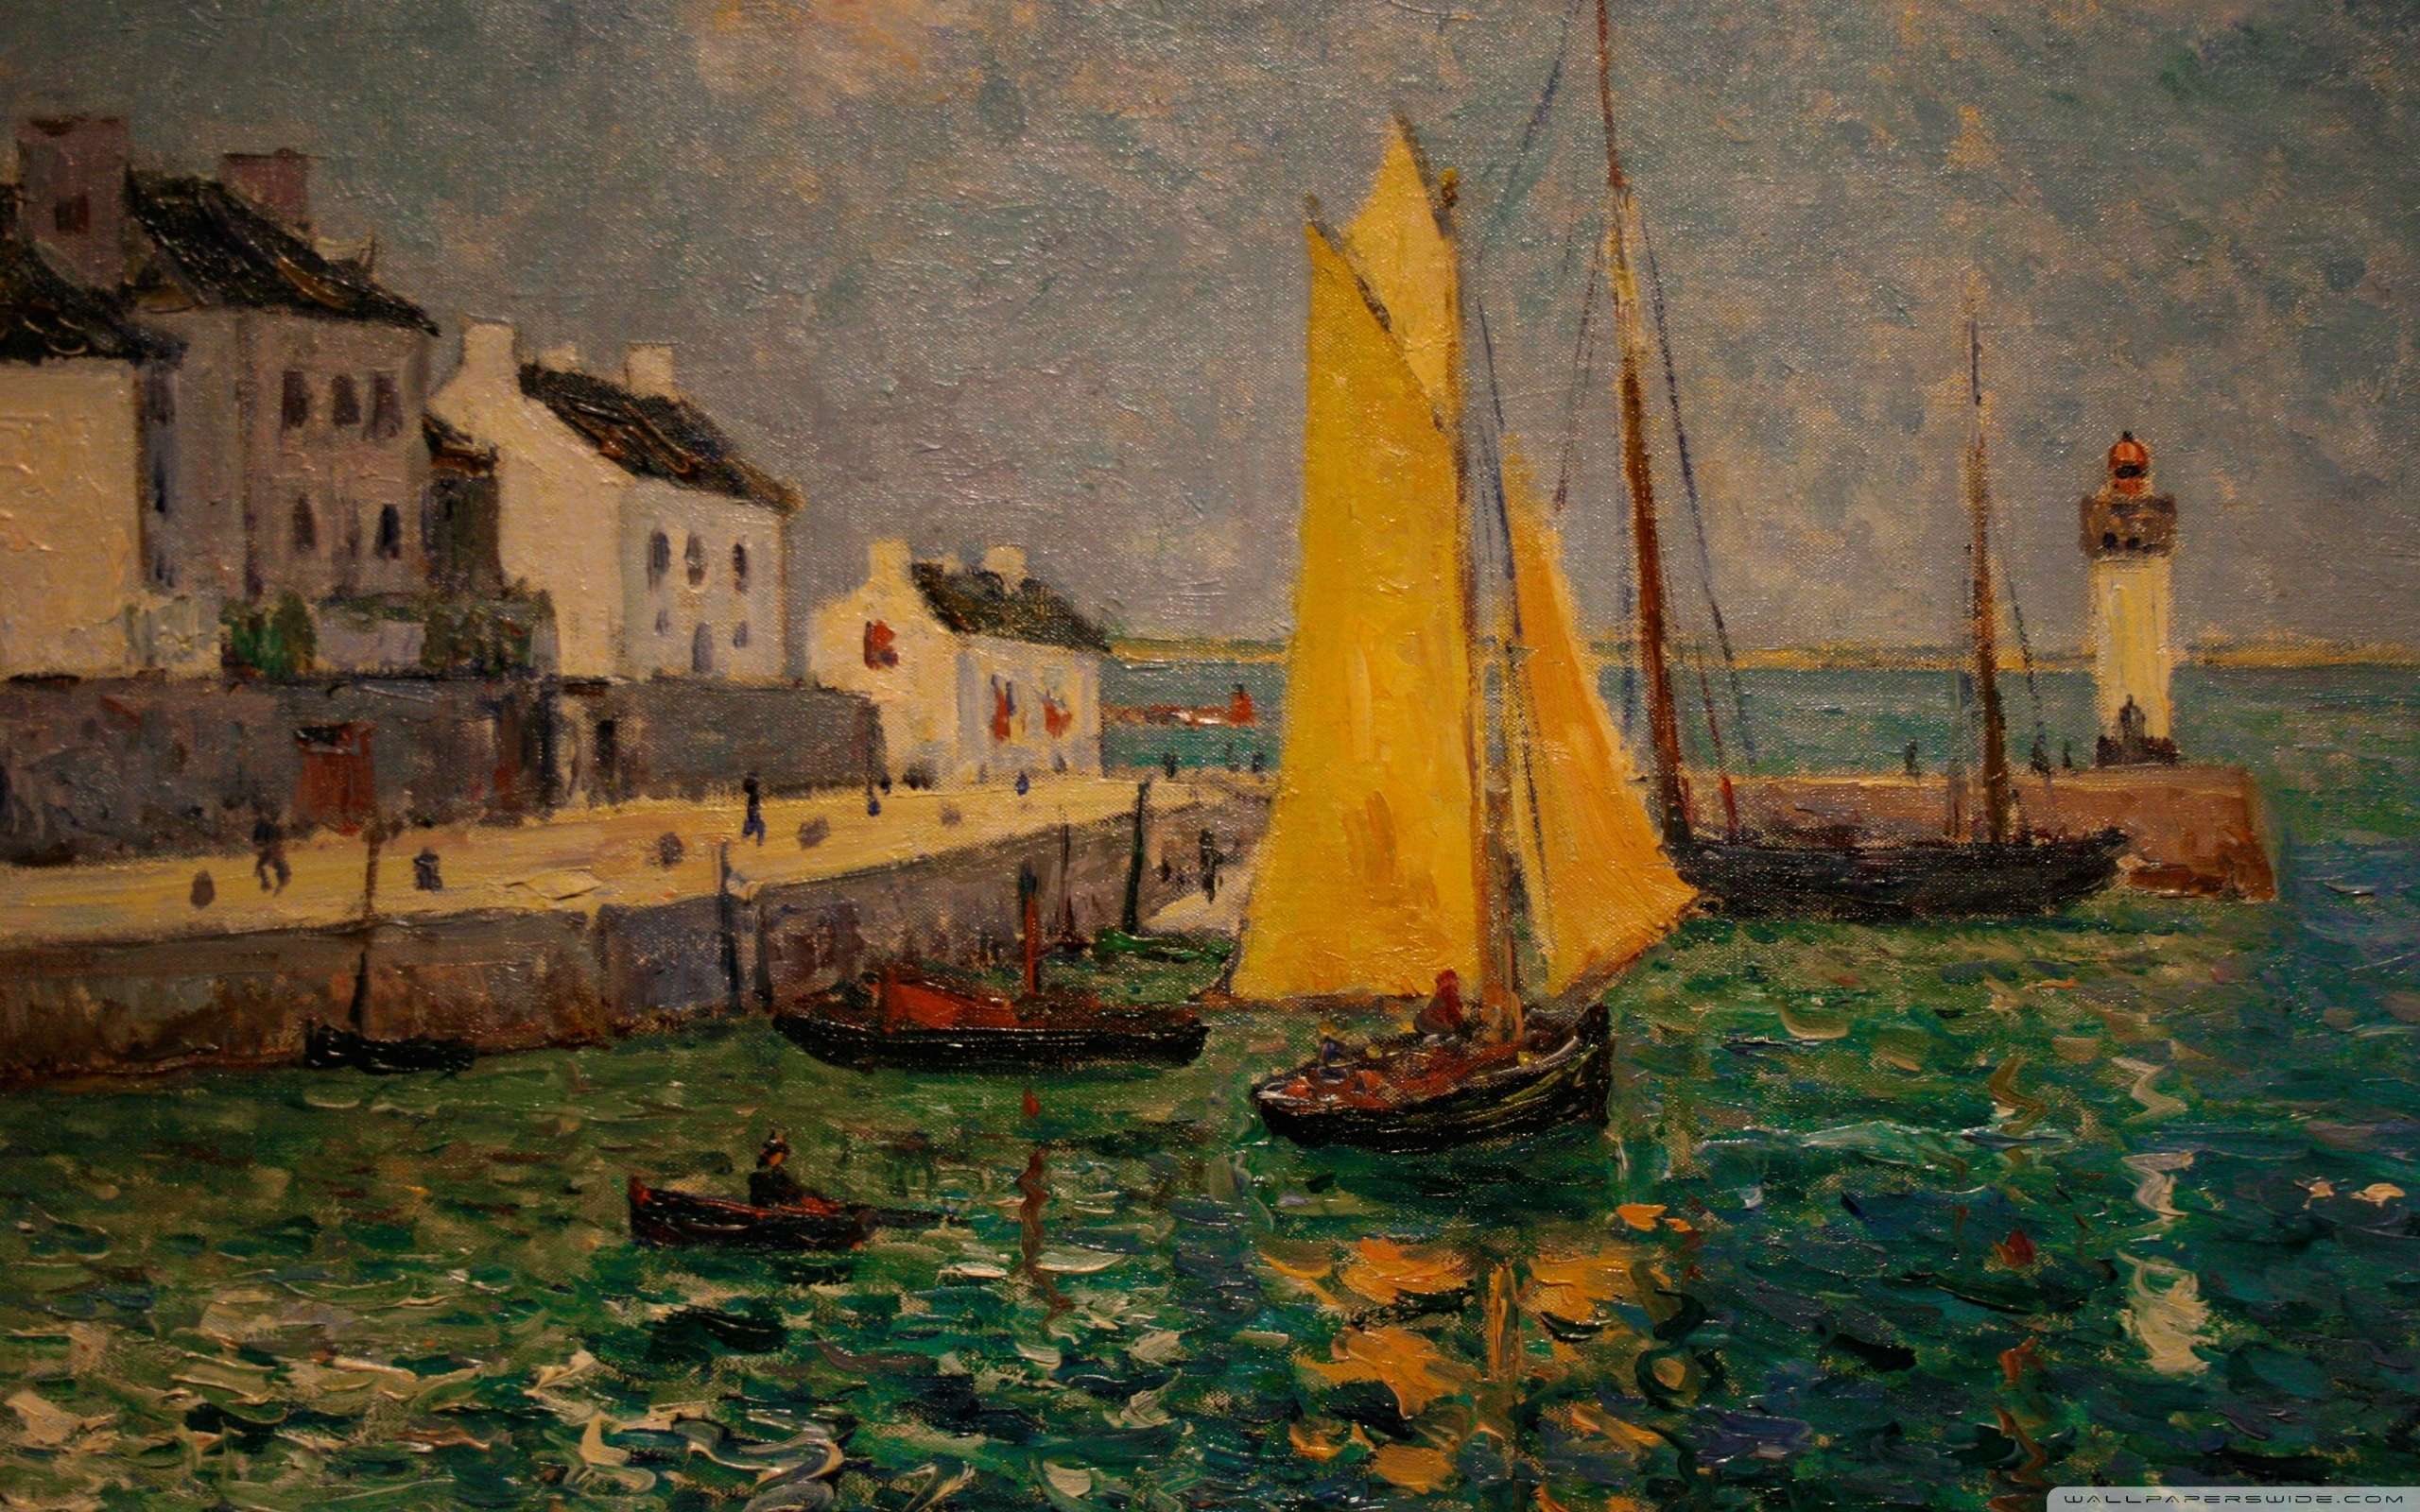 painting montreal museum of fine arts ❤ 4k hd desktop wallpaper for